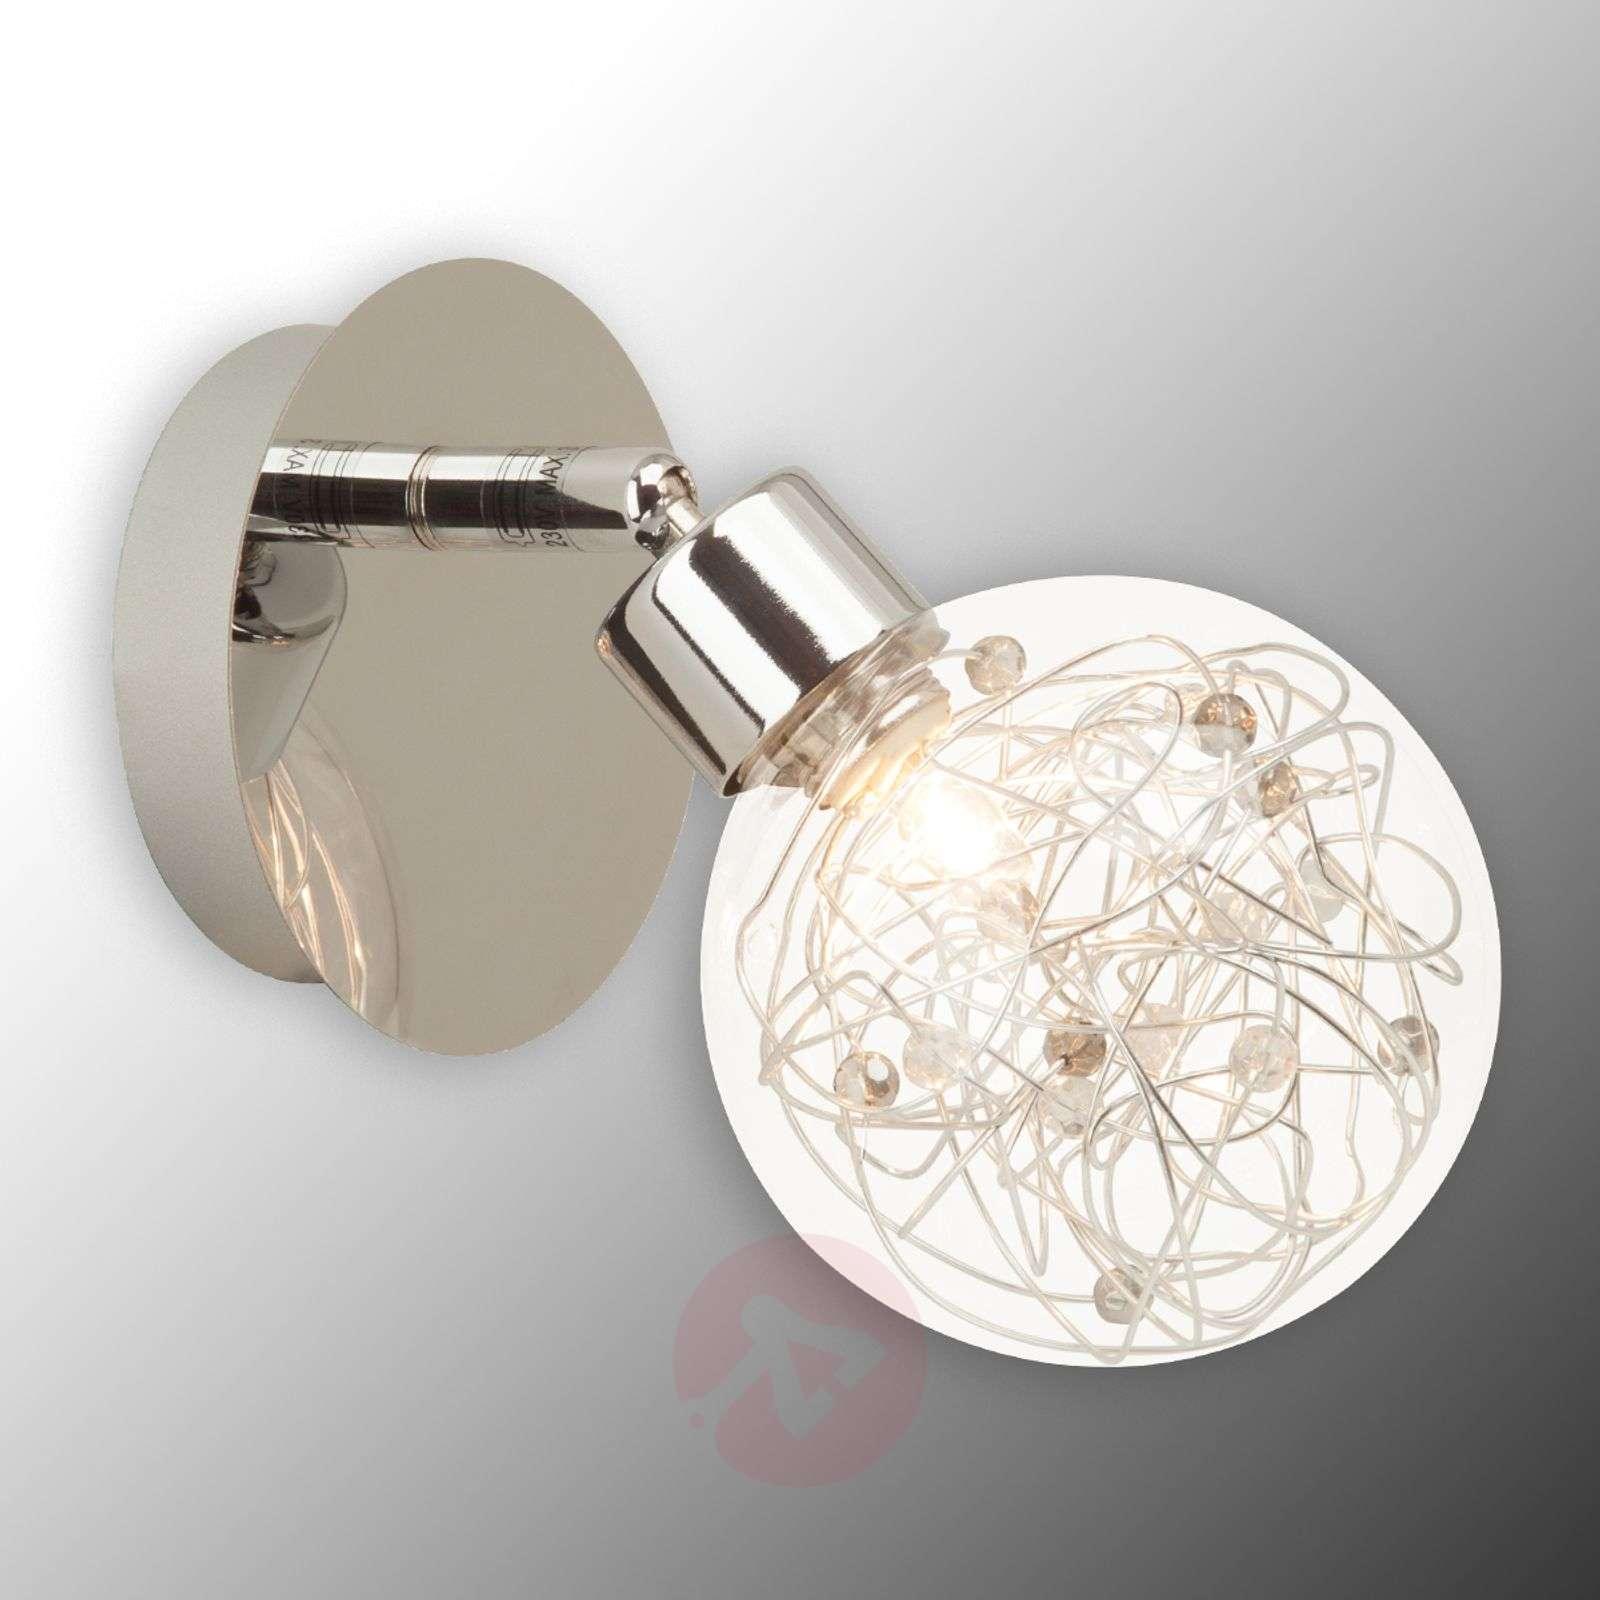 Effective wall light Joya-1509044-01